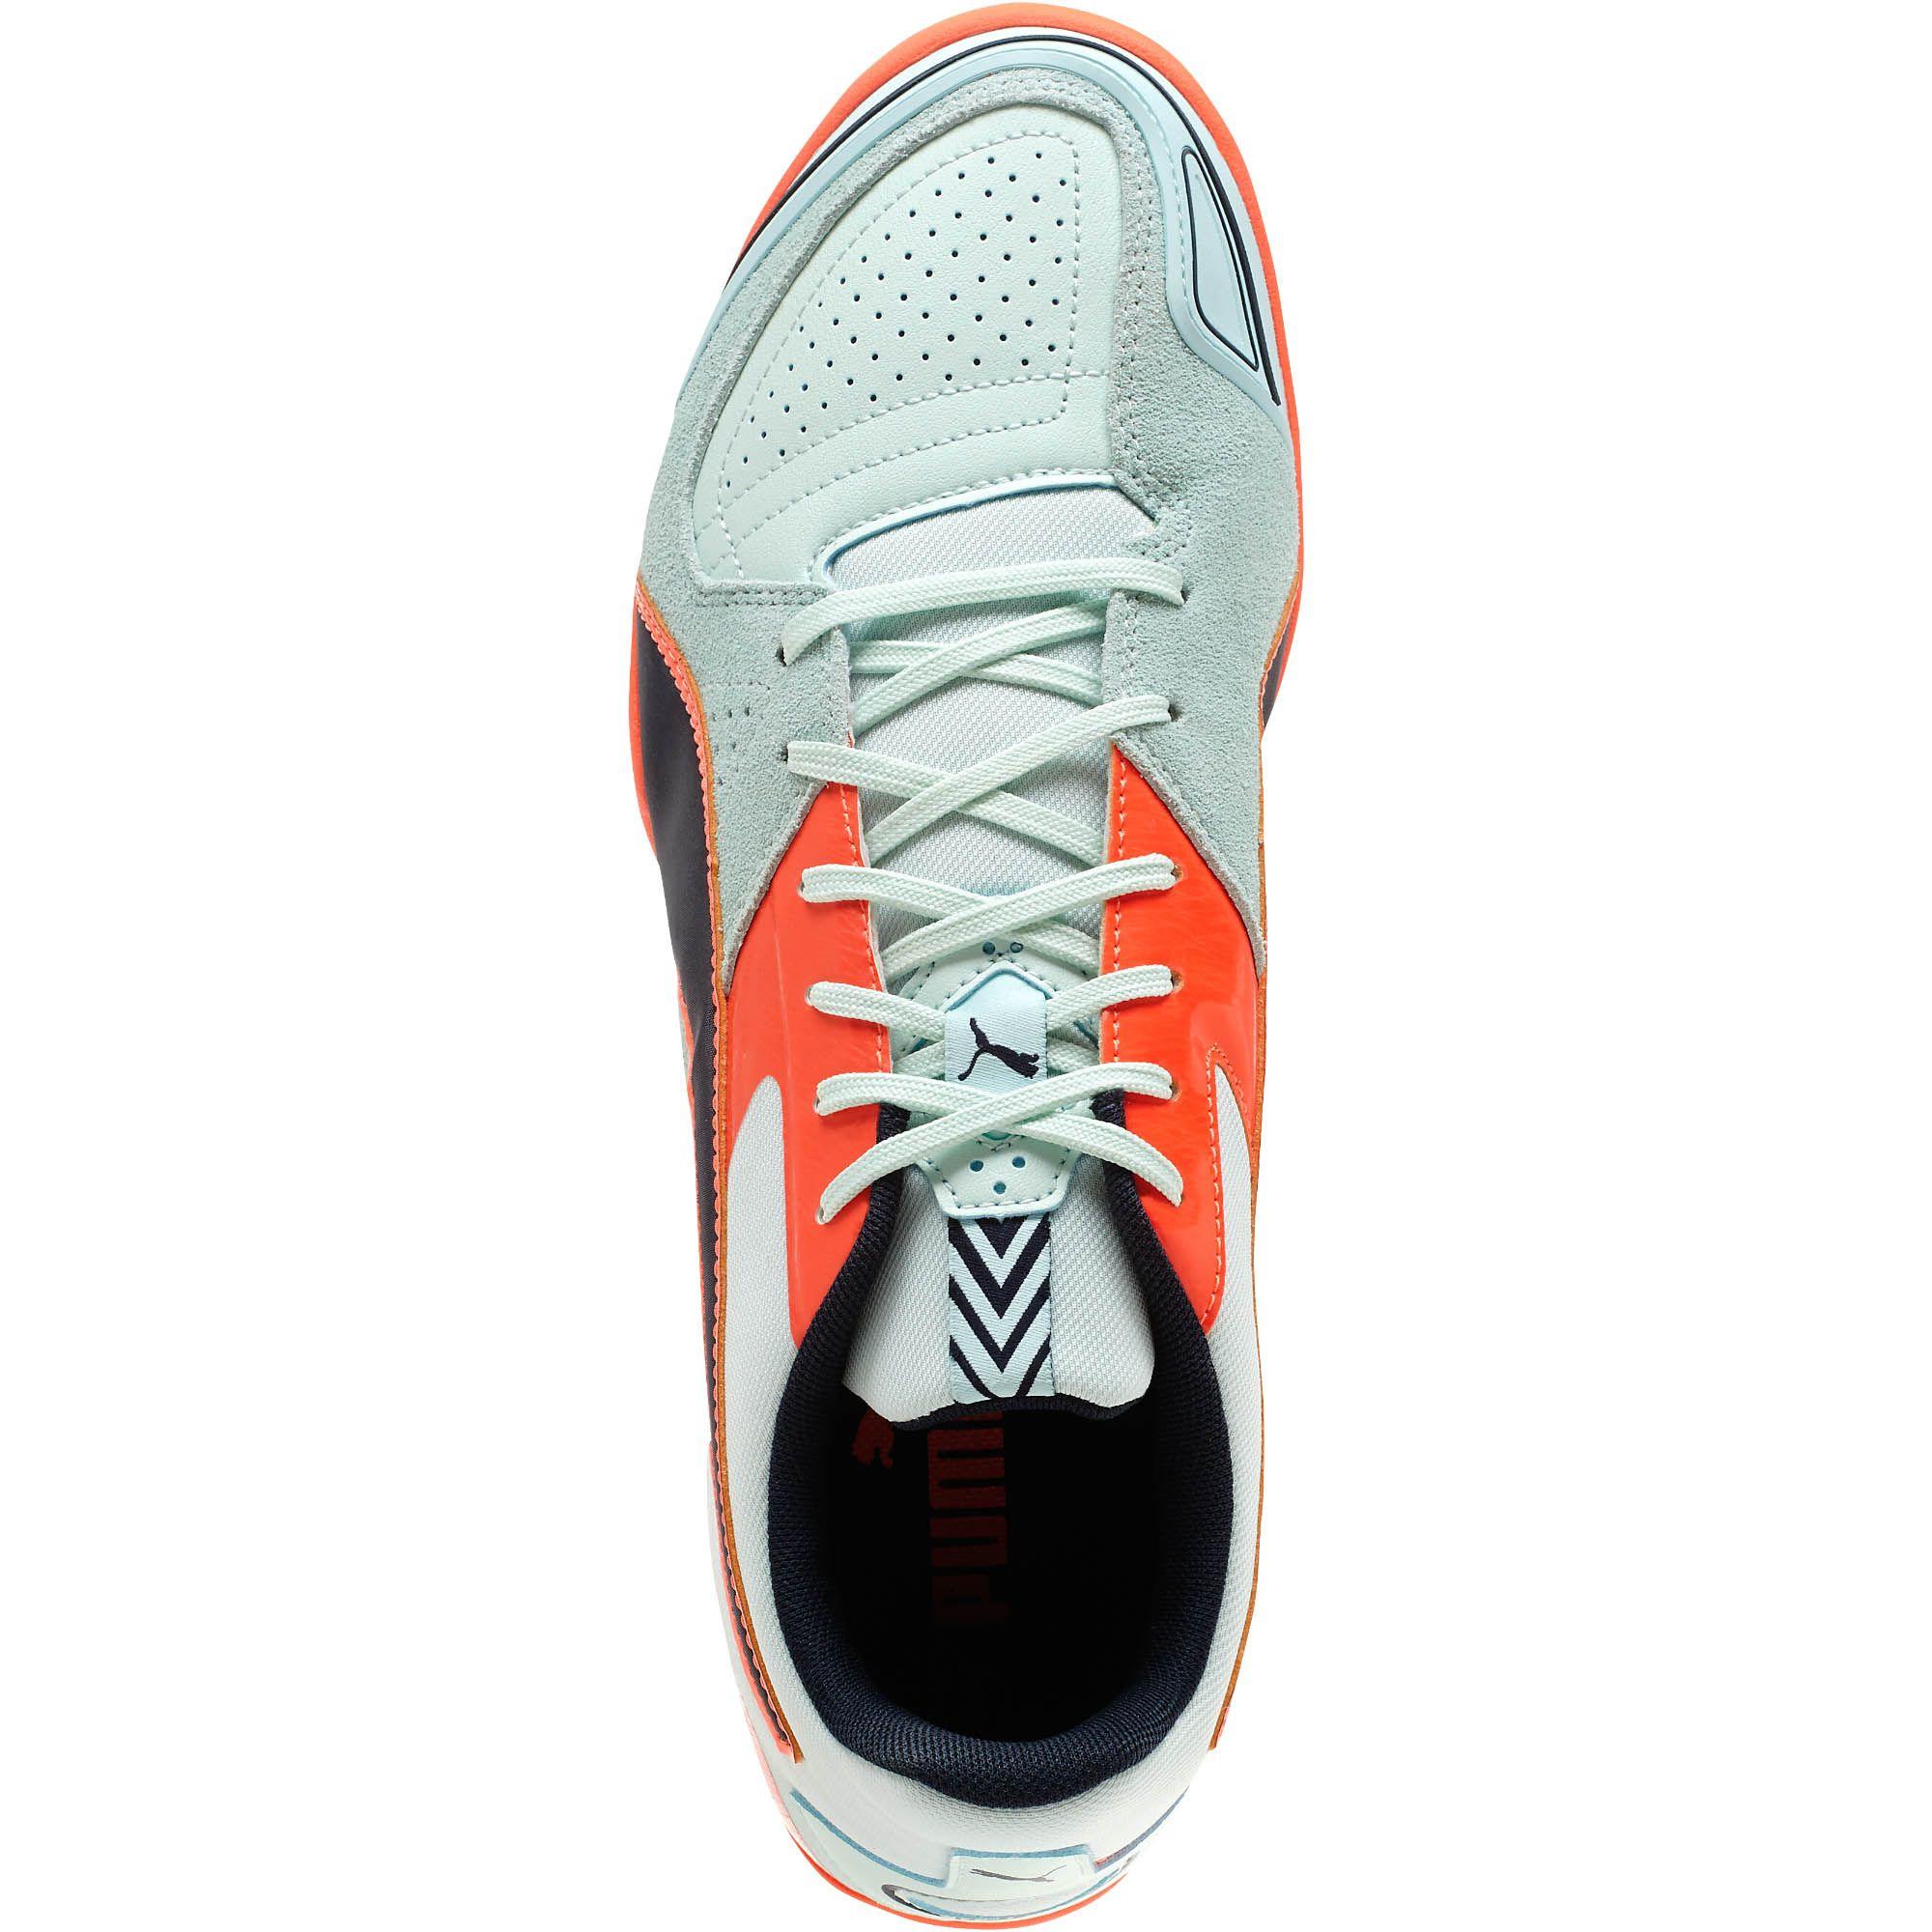 7c8c70755 PUMA Invicto Sala Men s Indoor Soccer Shoes in Gray for Men - Lyst